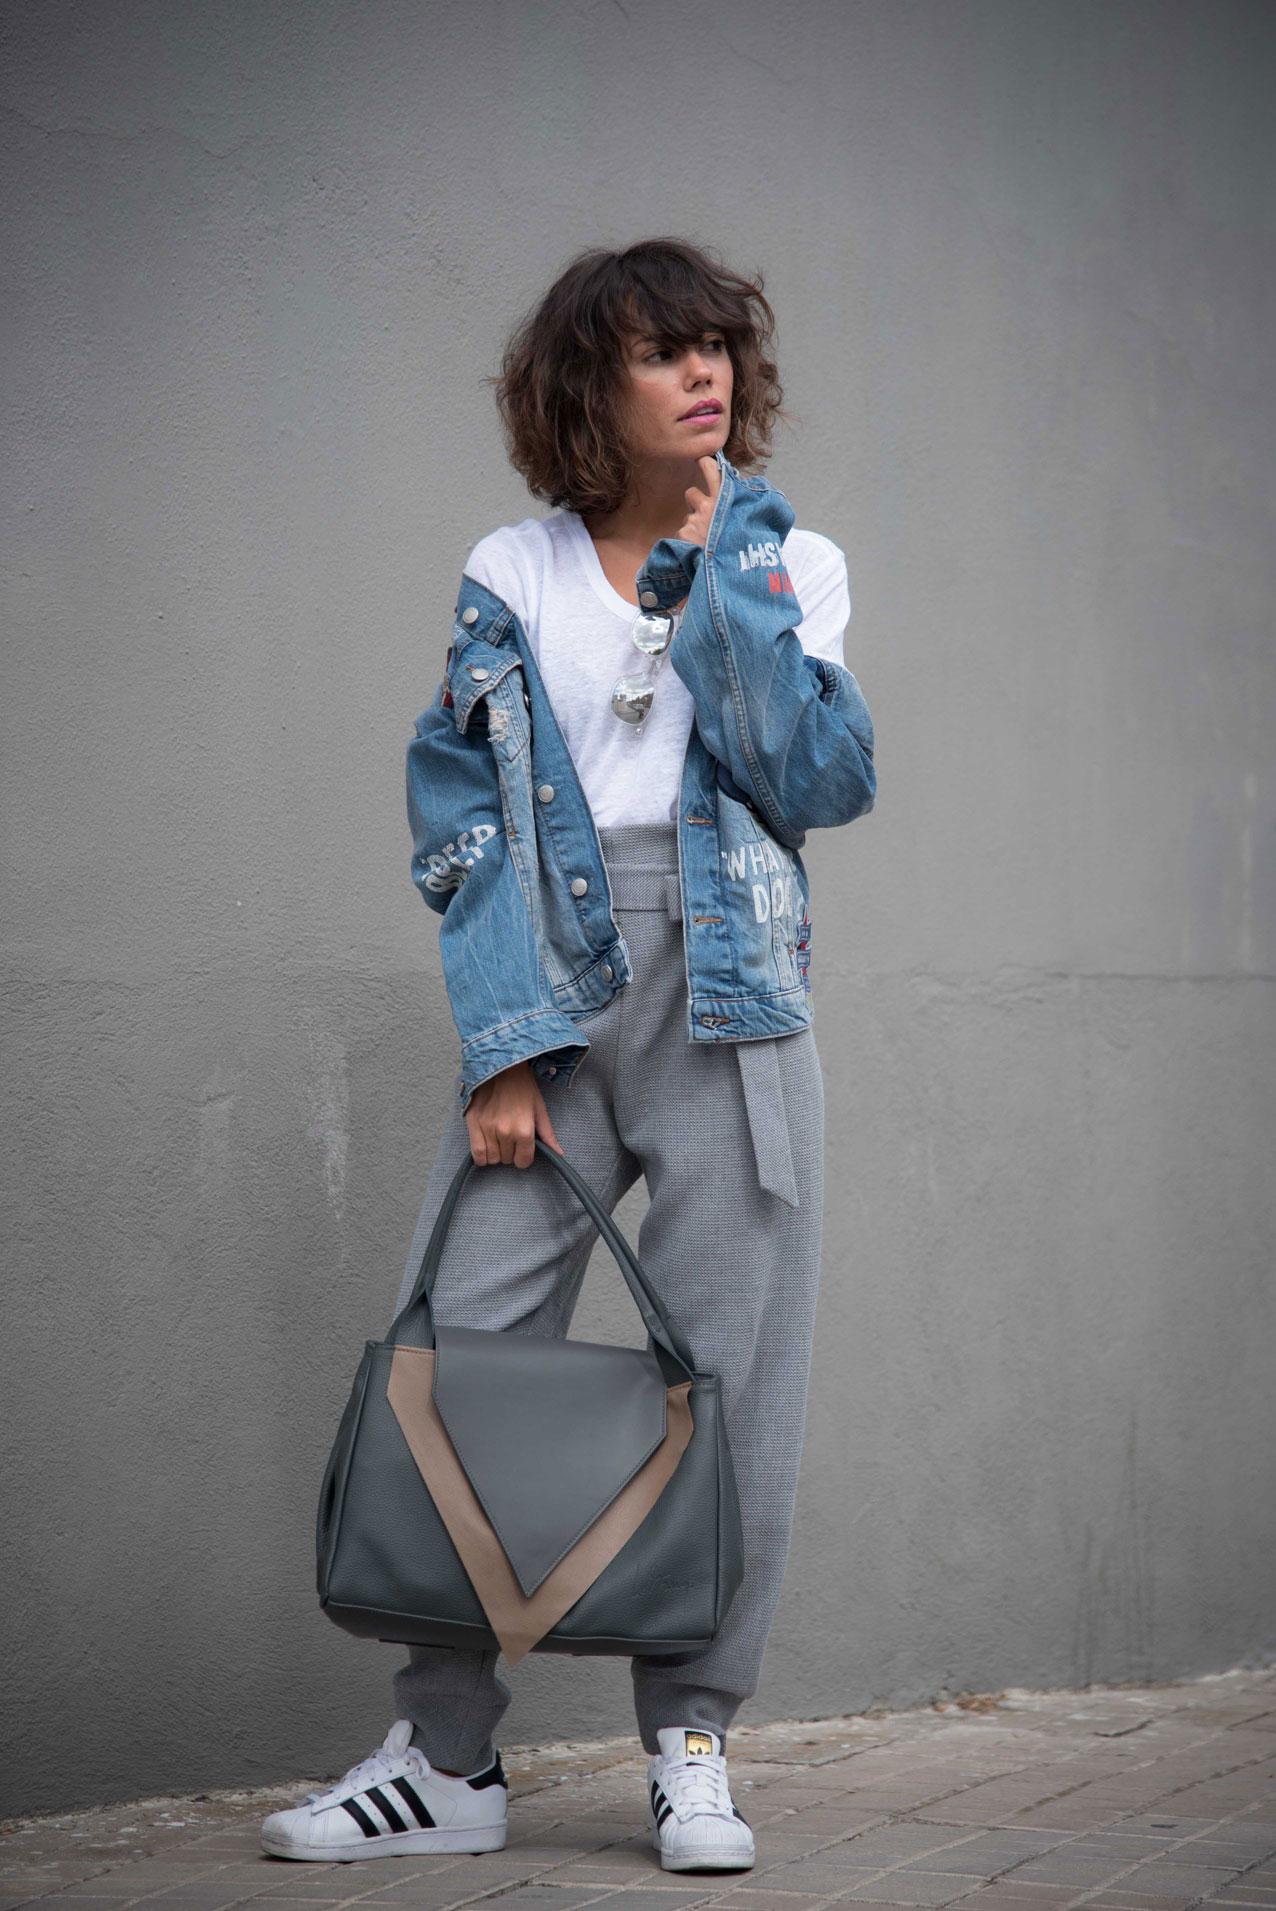 be_le_muy-bag-mogambo-cartoons_denim_jacket-grey_look-streetstyle-cool_lemonade10